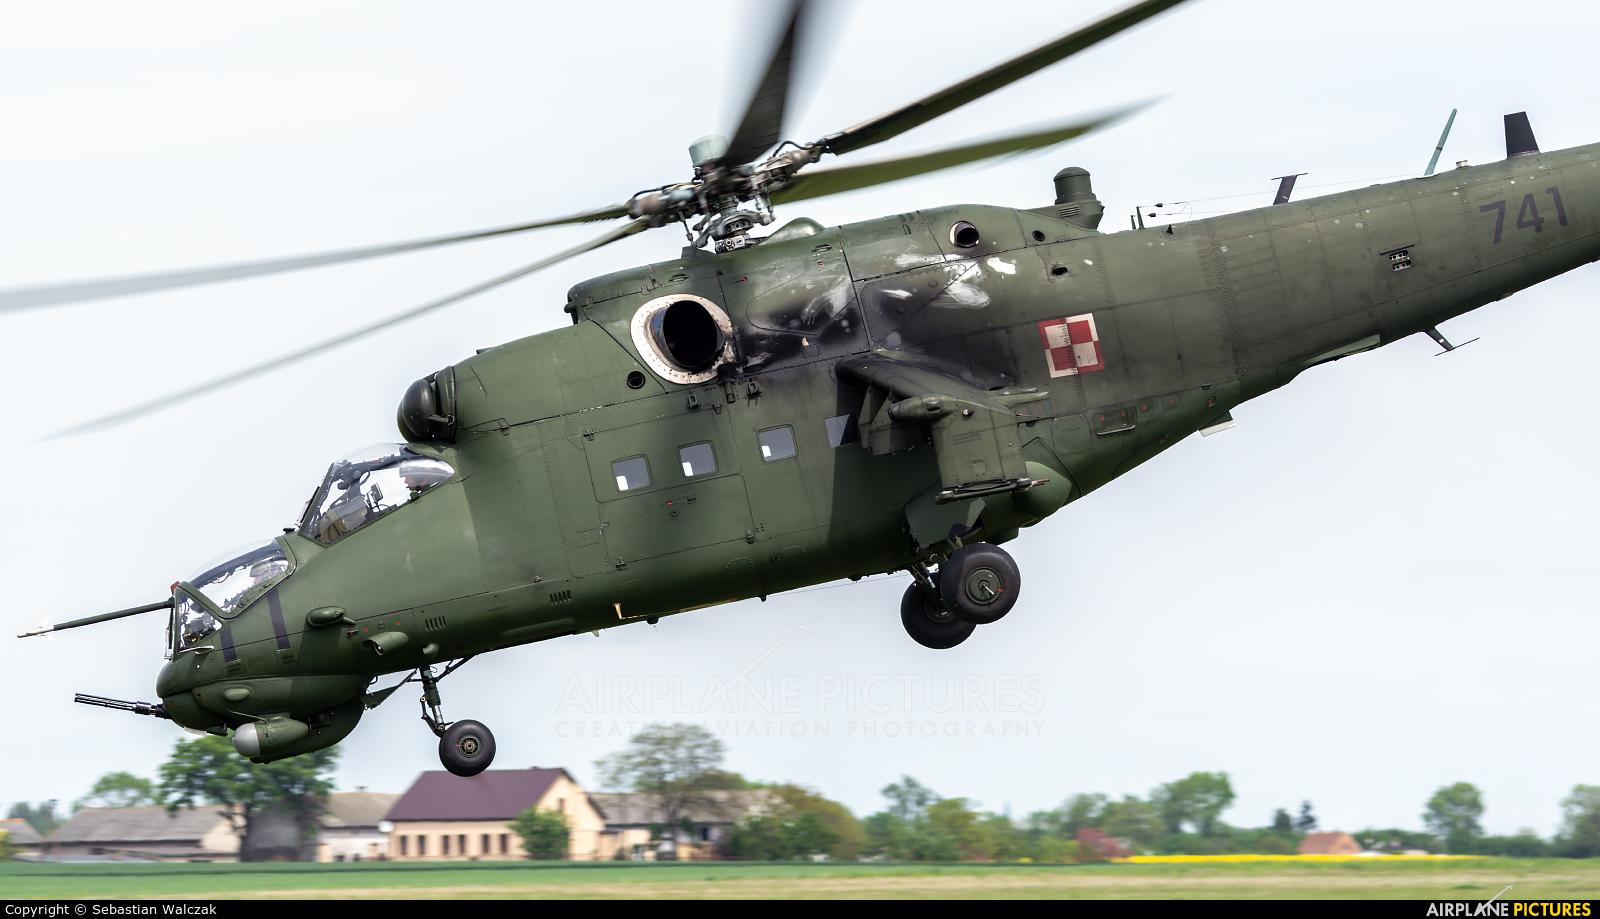 Poland - Army 741 aircraft at Inowrocław